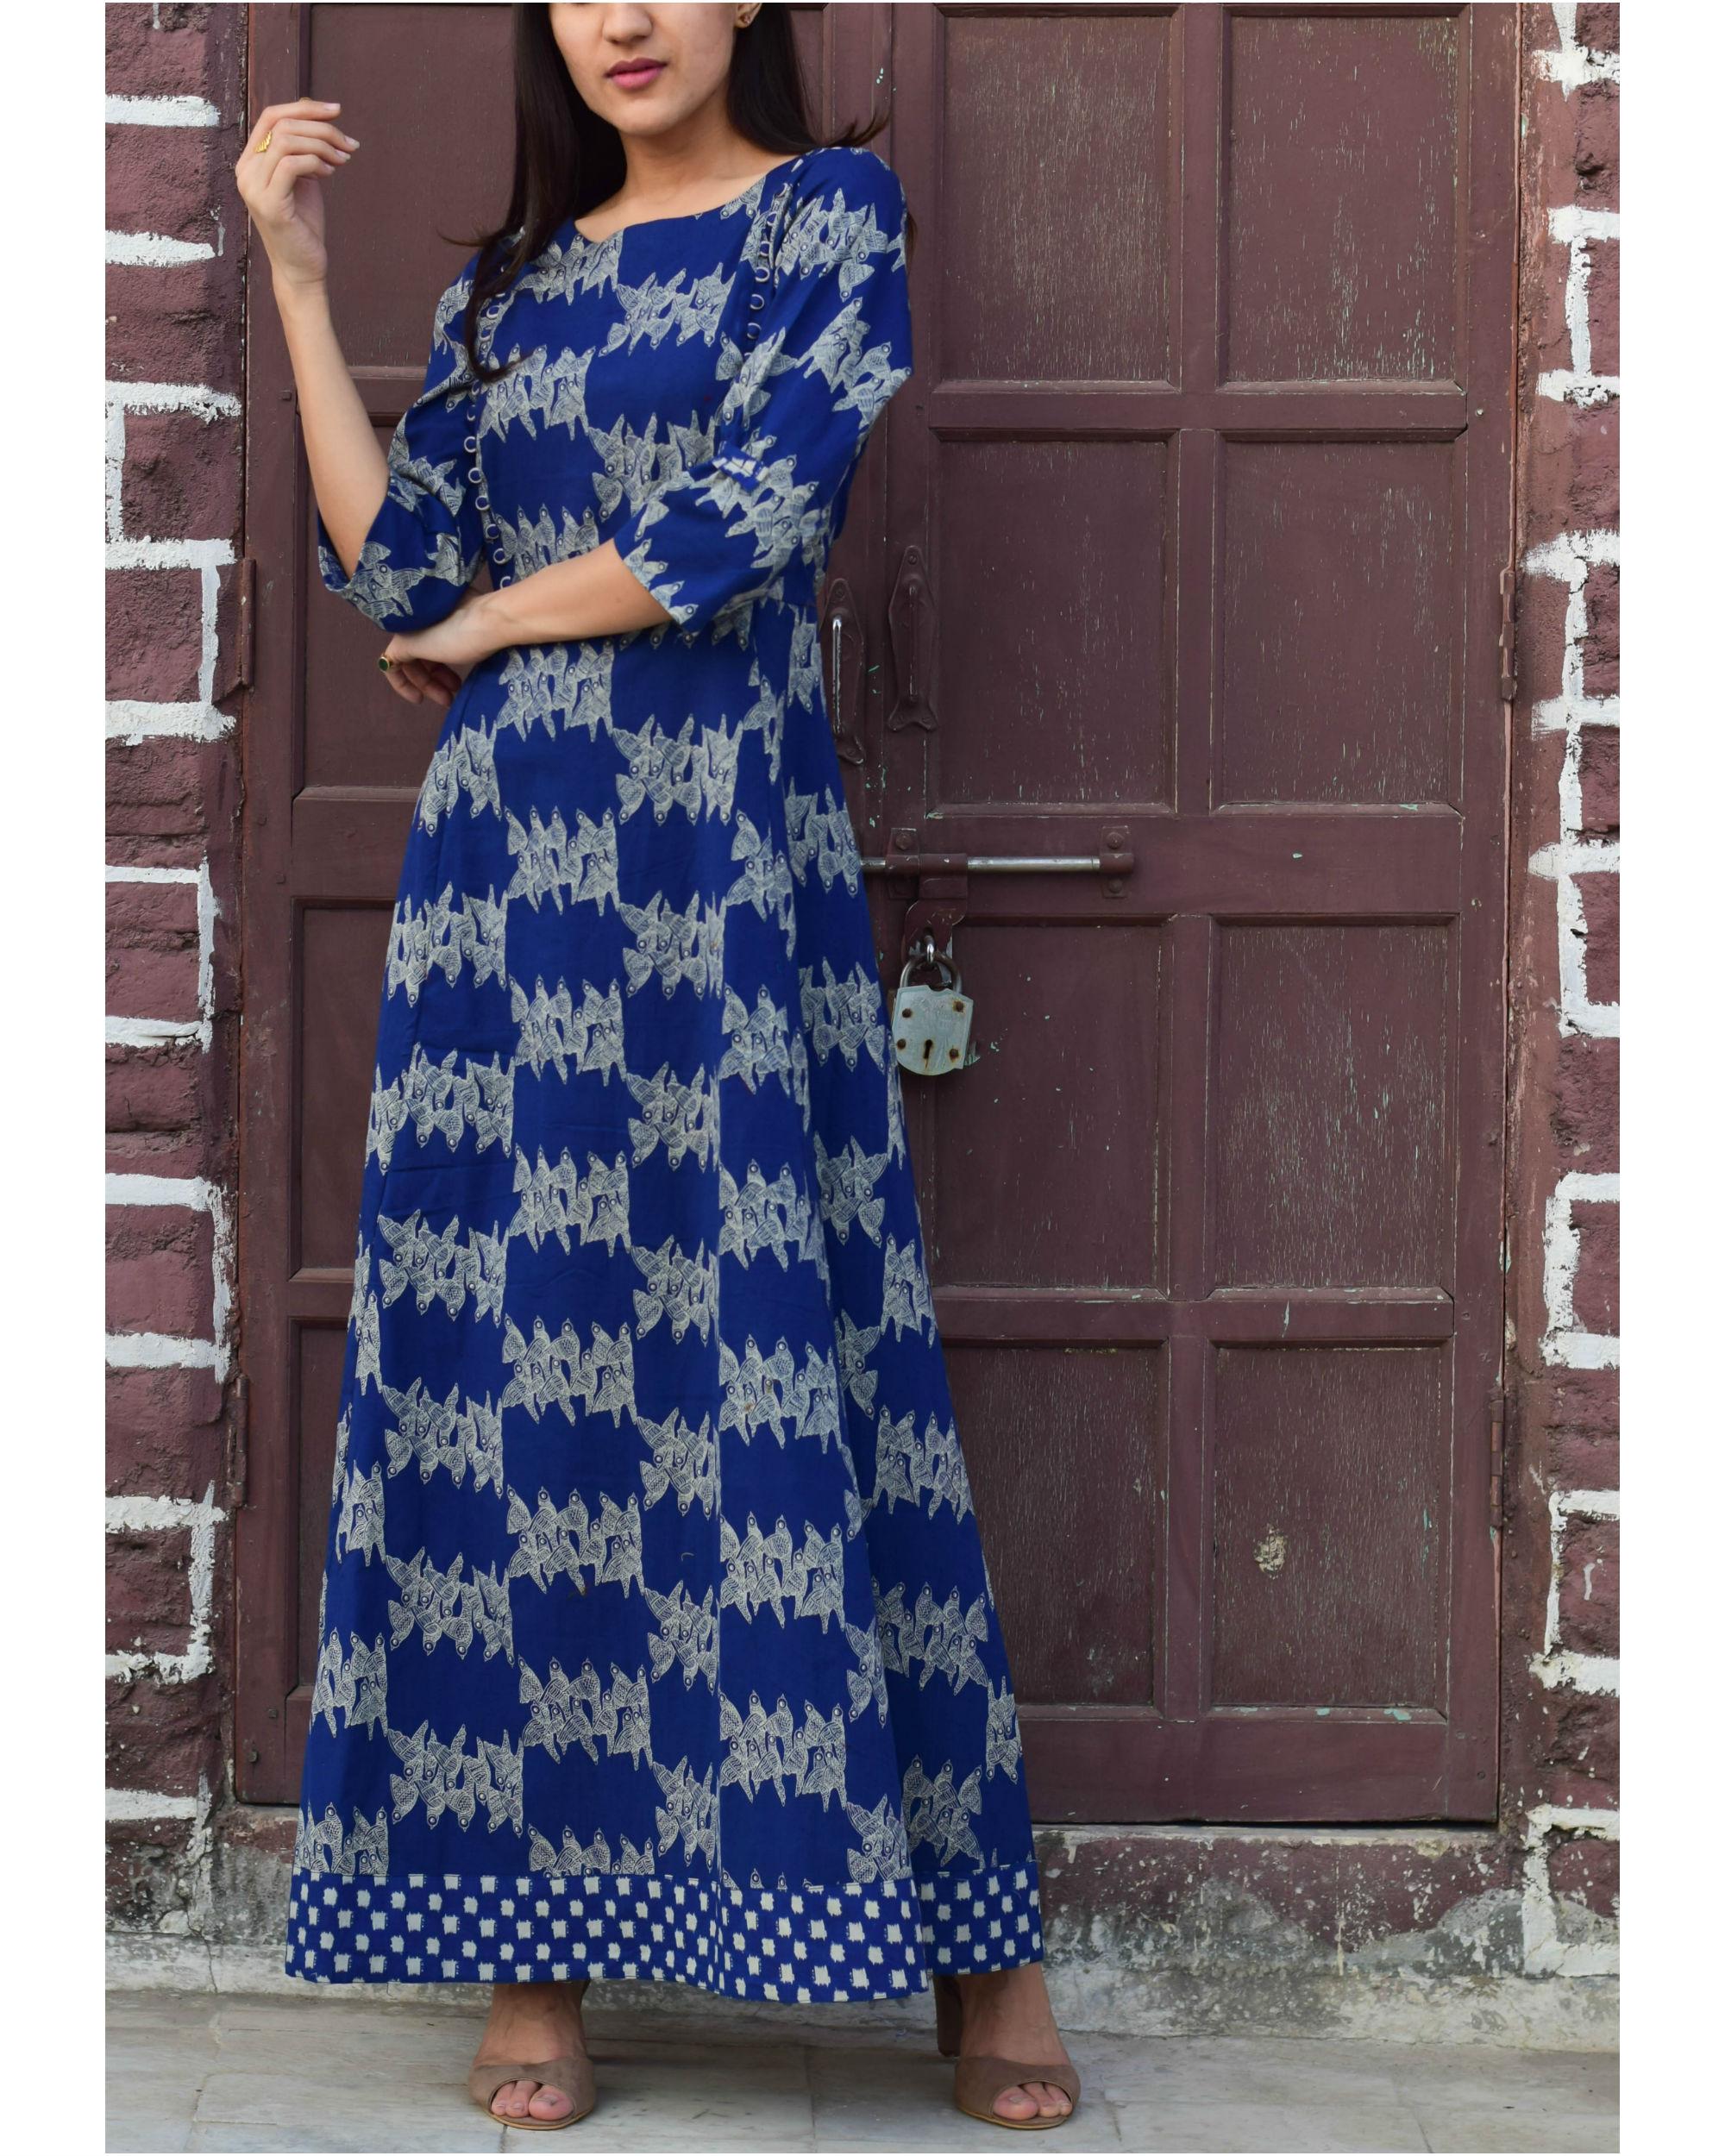 Blue checkered border dress